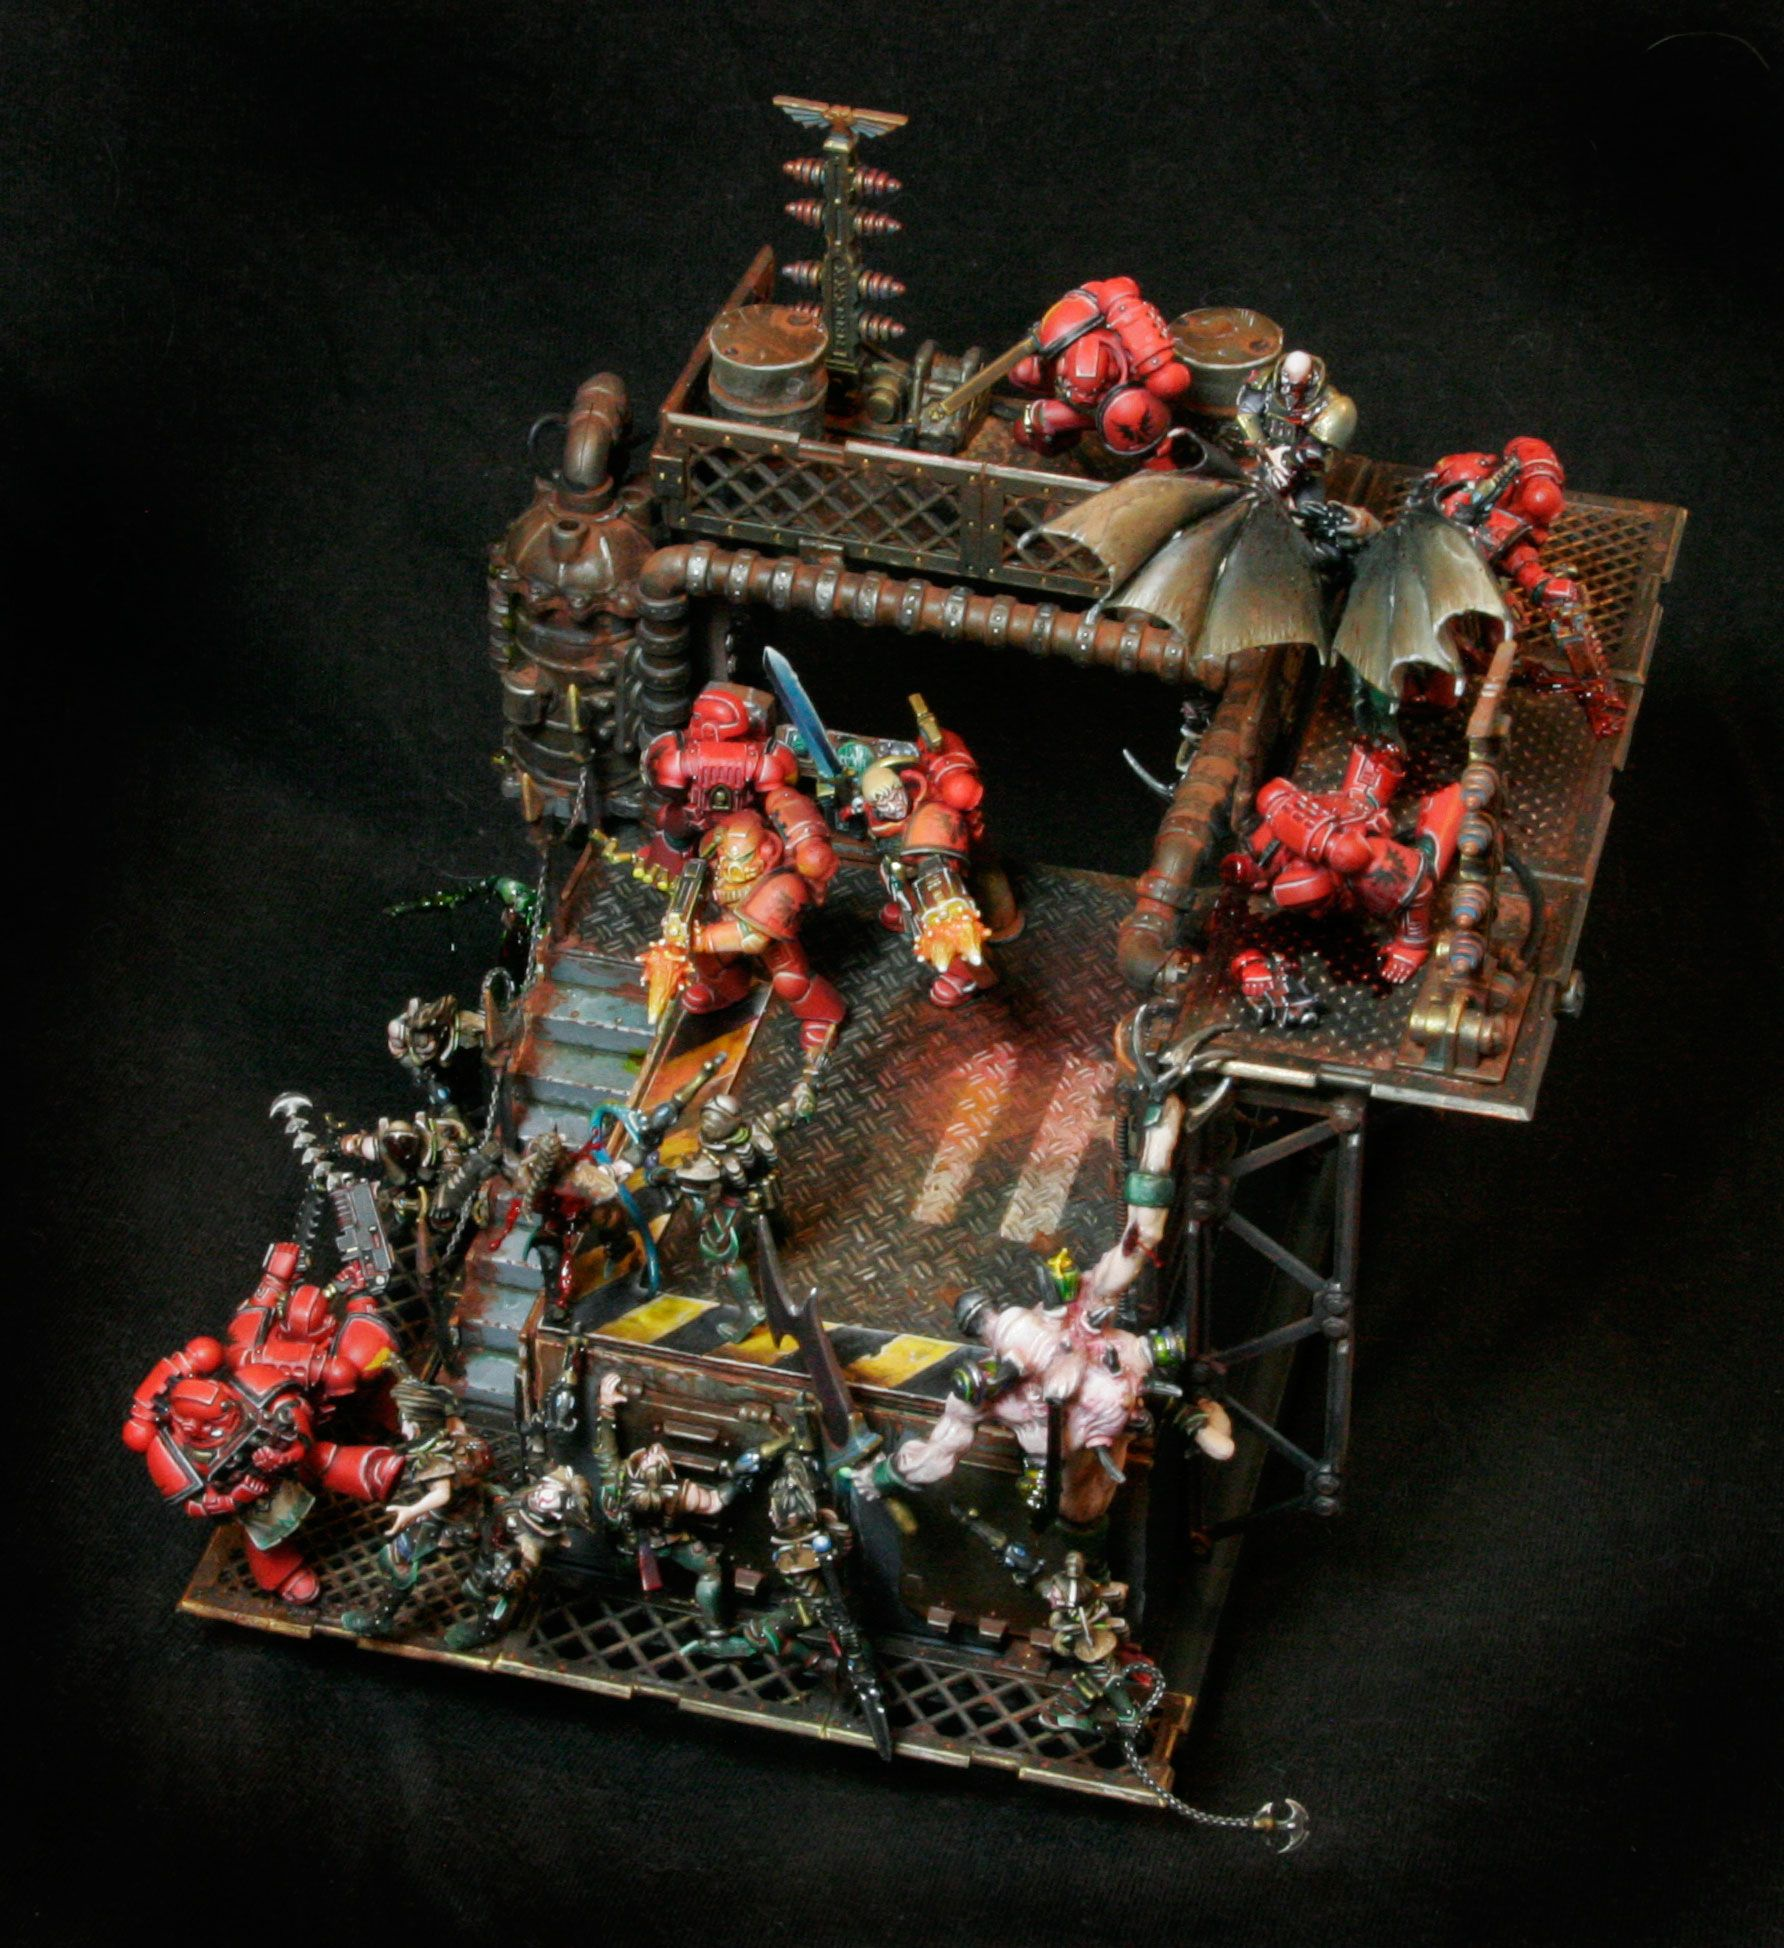 Warhammer 40k Blood Angels: Blood Angels Space Marines Vs Dark Eldar Diorama